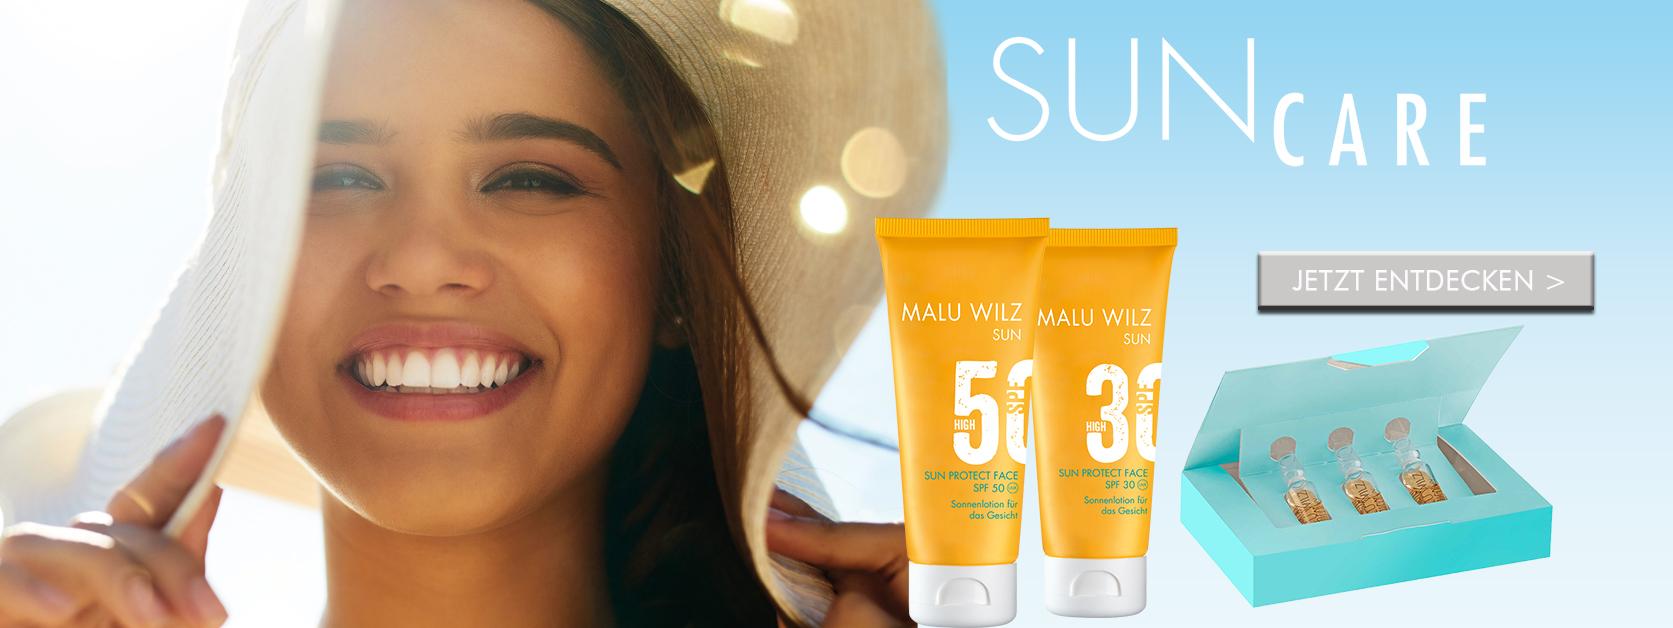 Frau mit Sonnenpflege-Produkten